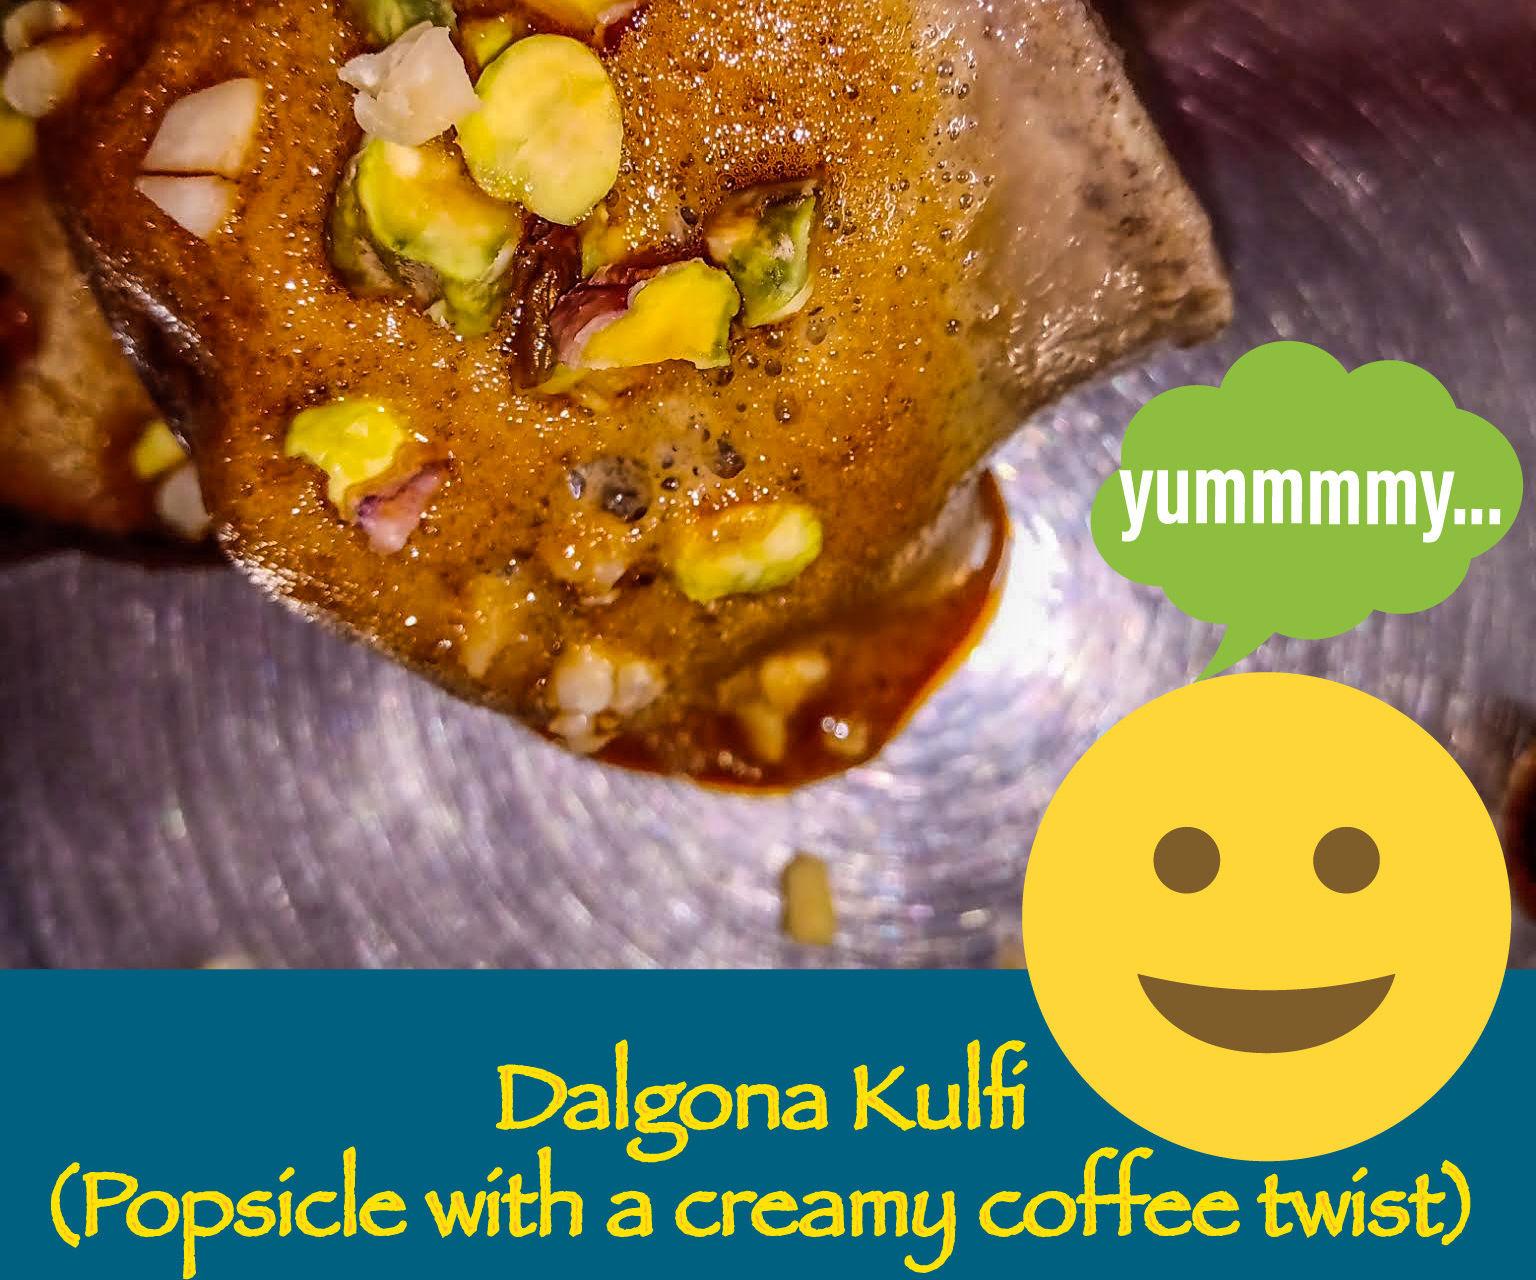 Trendylicious Dalgona Kulfi(Popsicle With a Coffee Twist)!